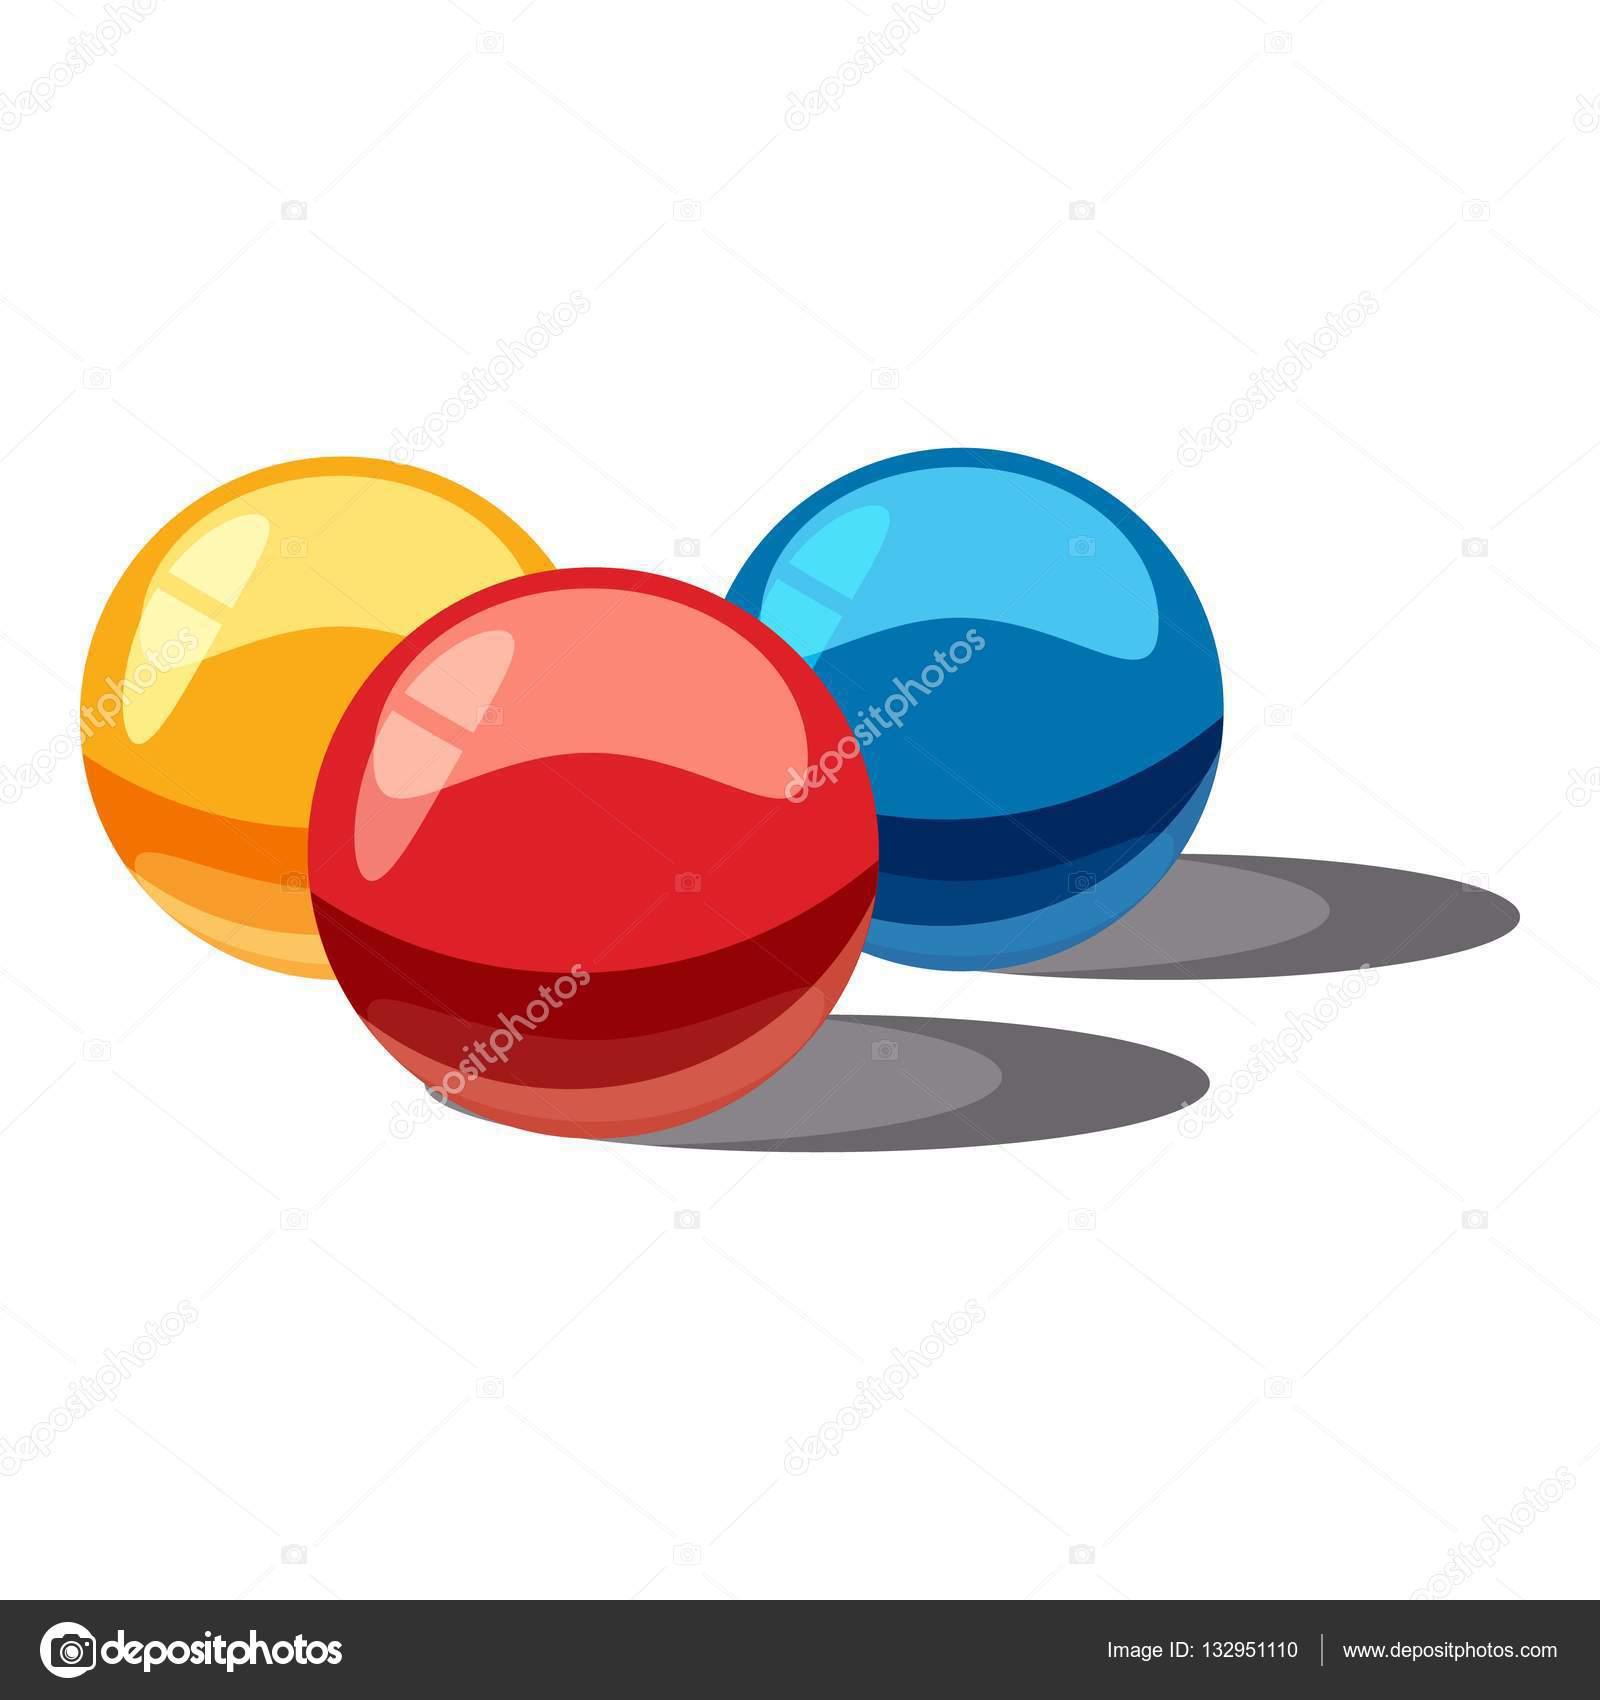 Bolas Para Paintball Icono De Estilo De Dibujos Animados Archivo